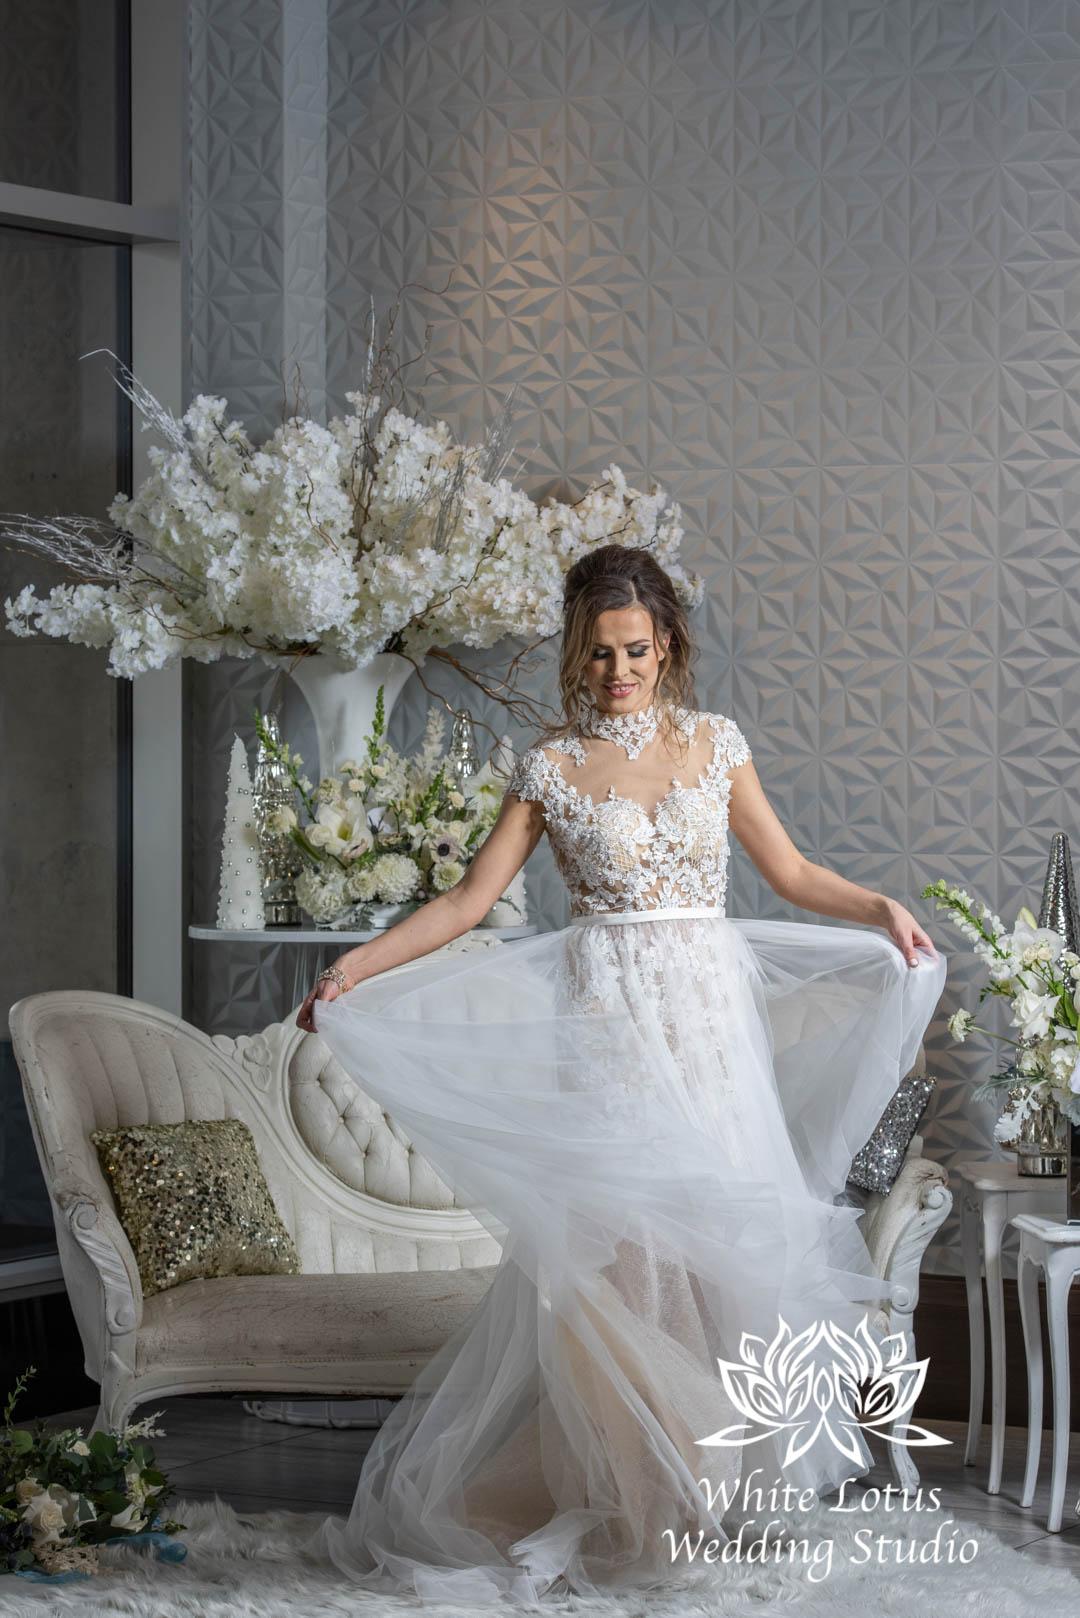 079- GLAM WINTERLUXE WEDDING INSPIRATION